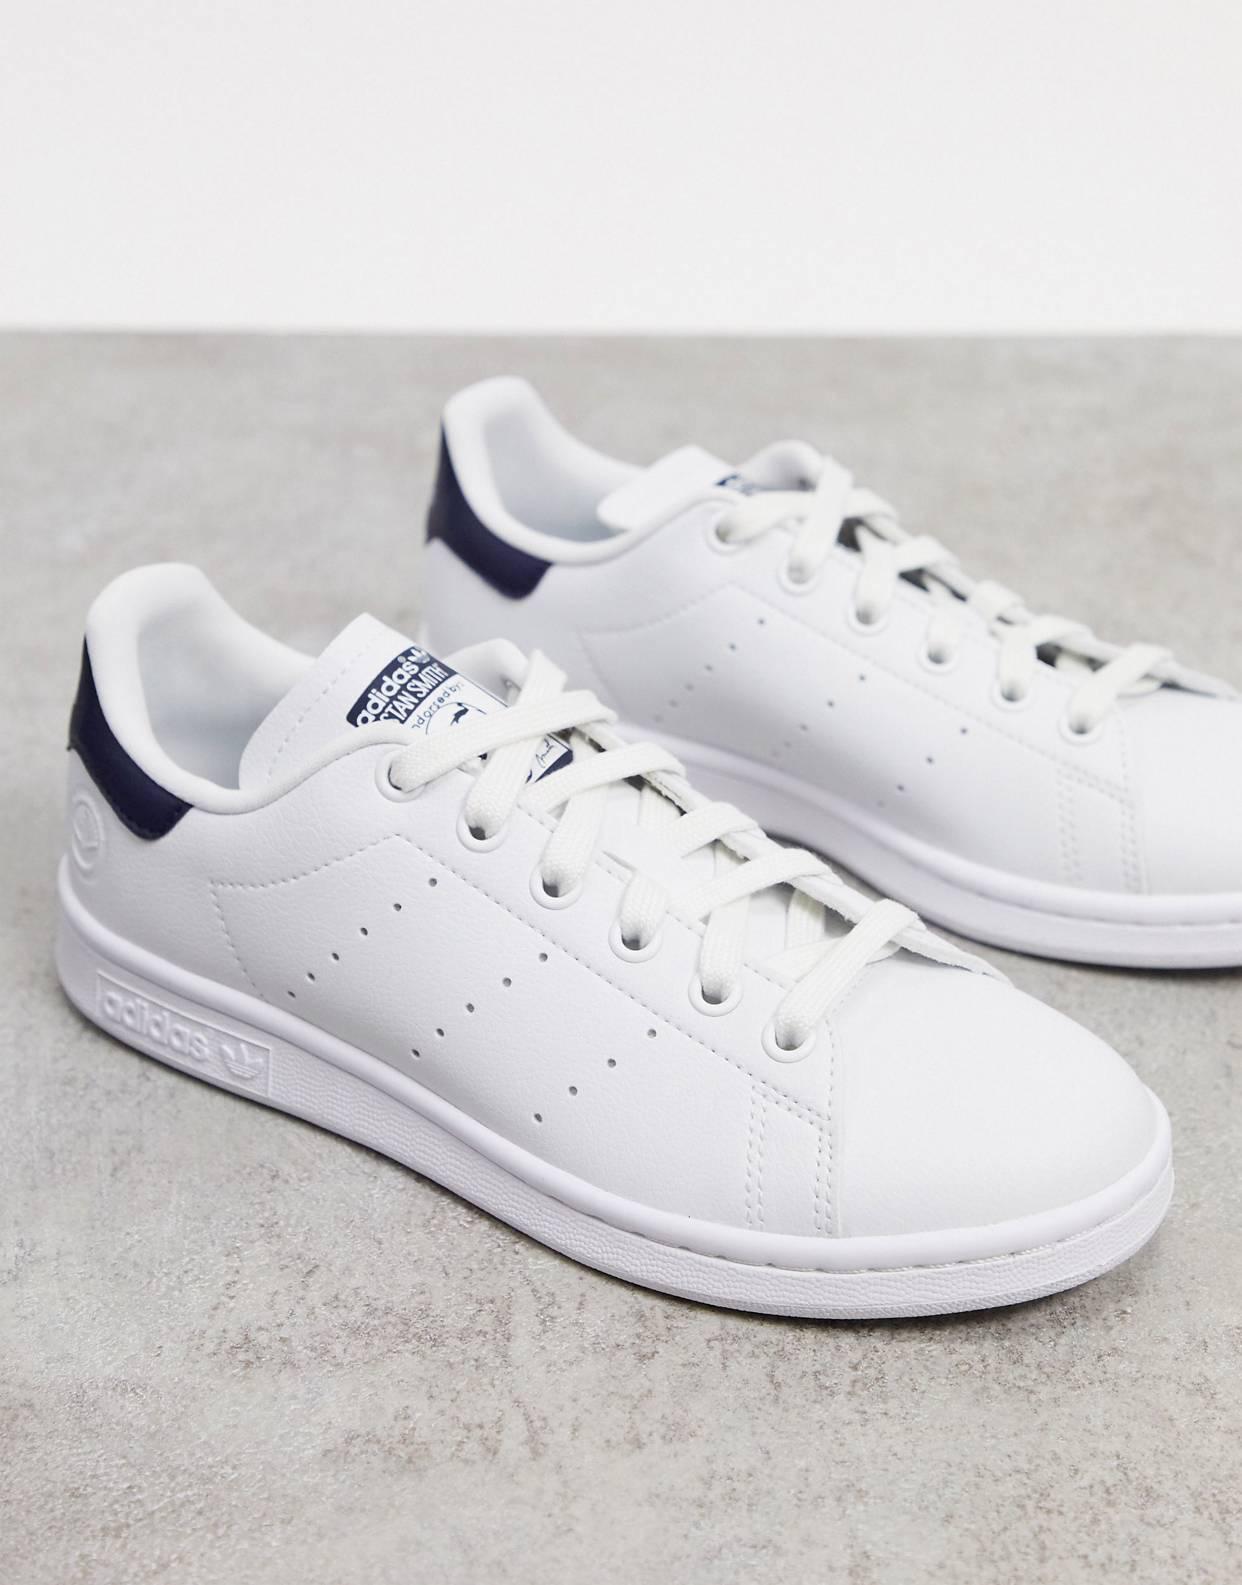 Adidas Original Stan Smith Vegan